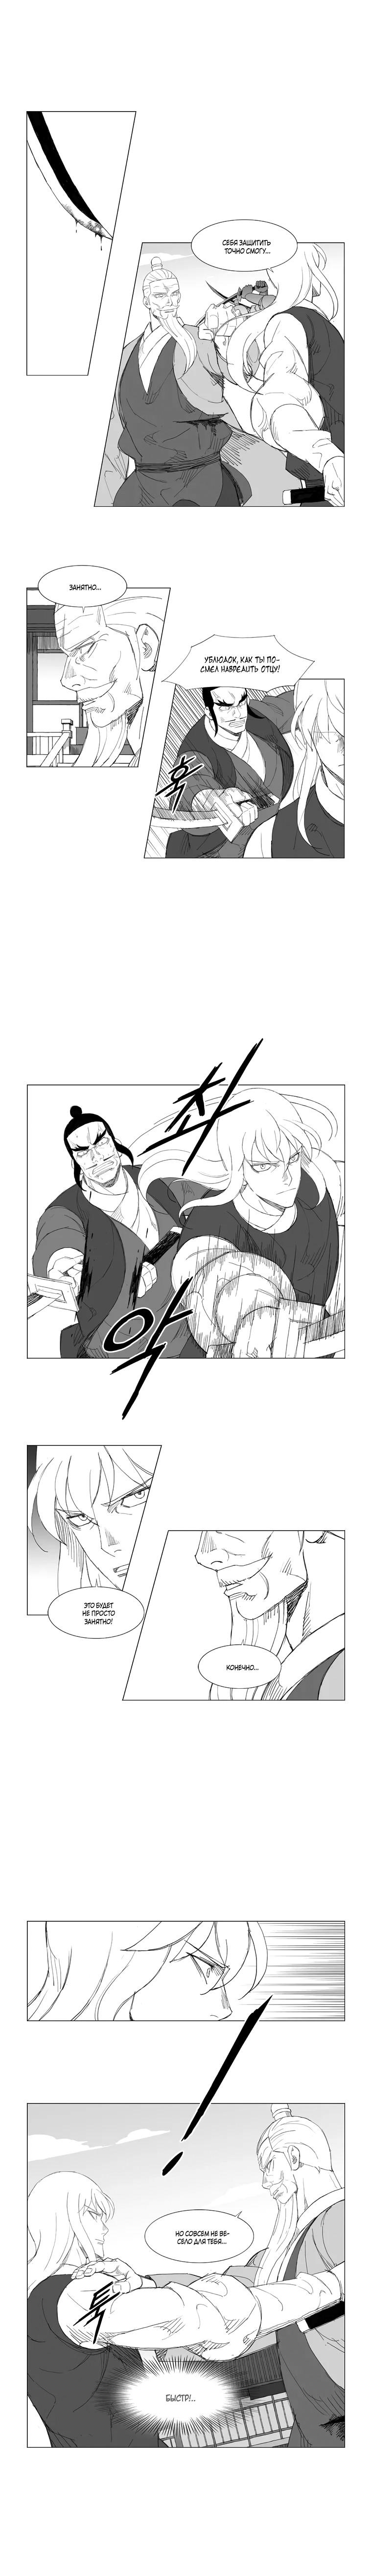 https://r1.ninemanga.com/comics/pic2/39/28263/411808/1524179113375.jpg Page 3